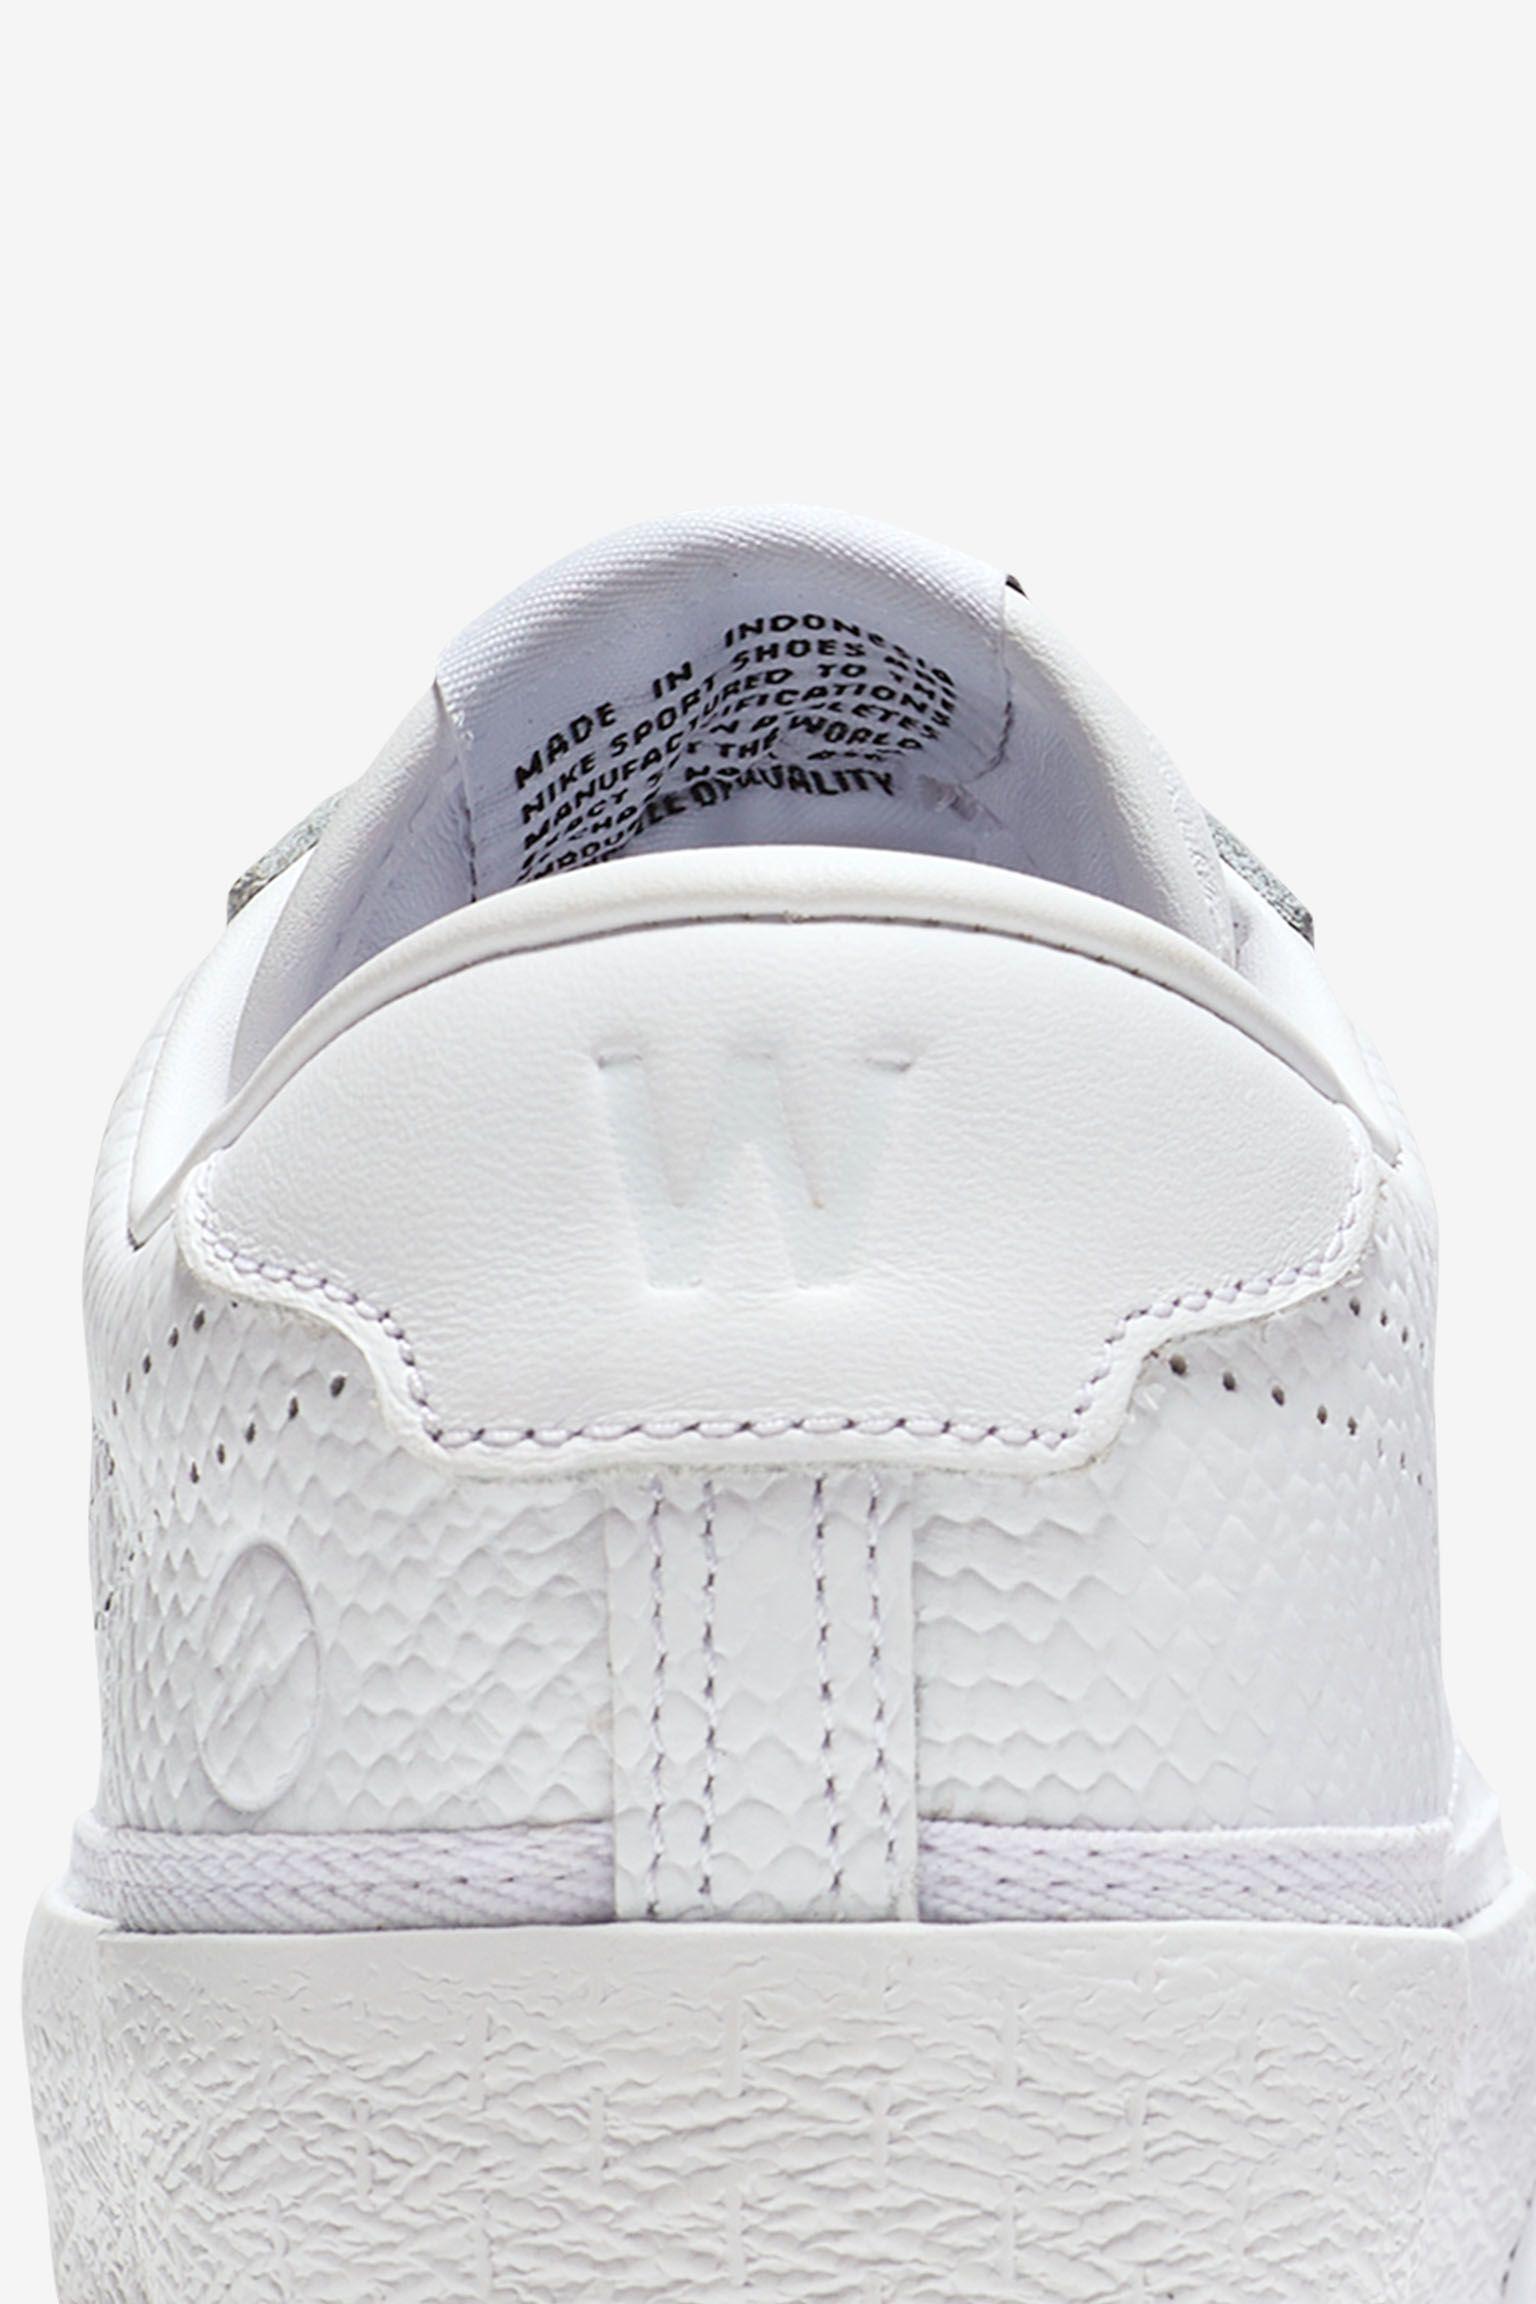 Women's Nike Zoom Tennis Classic x fragment 'White'